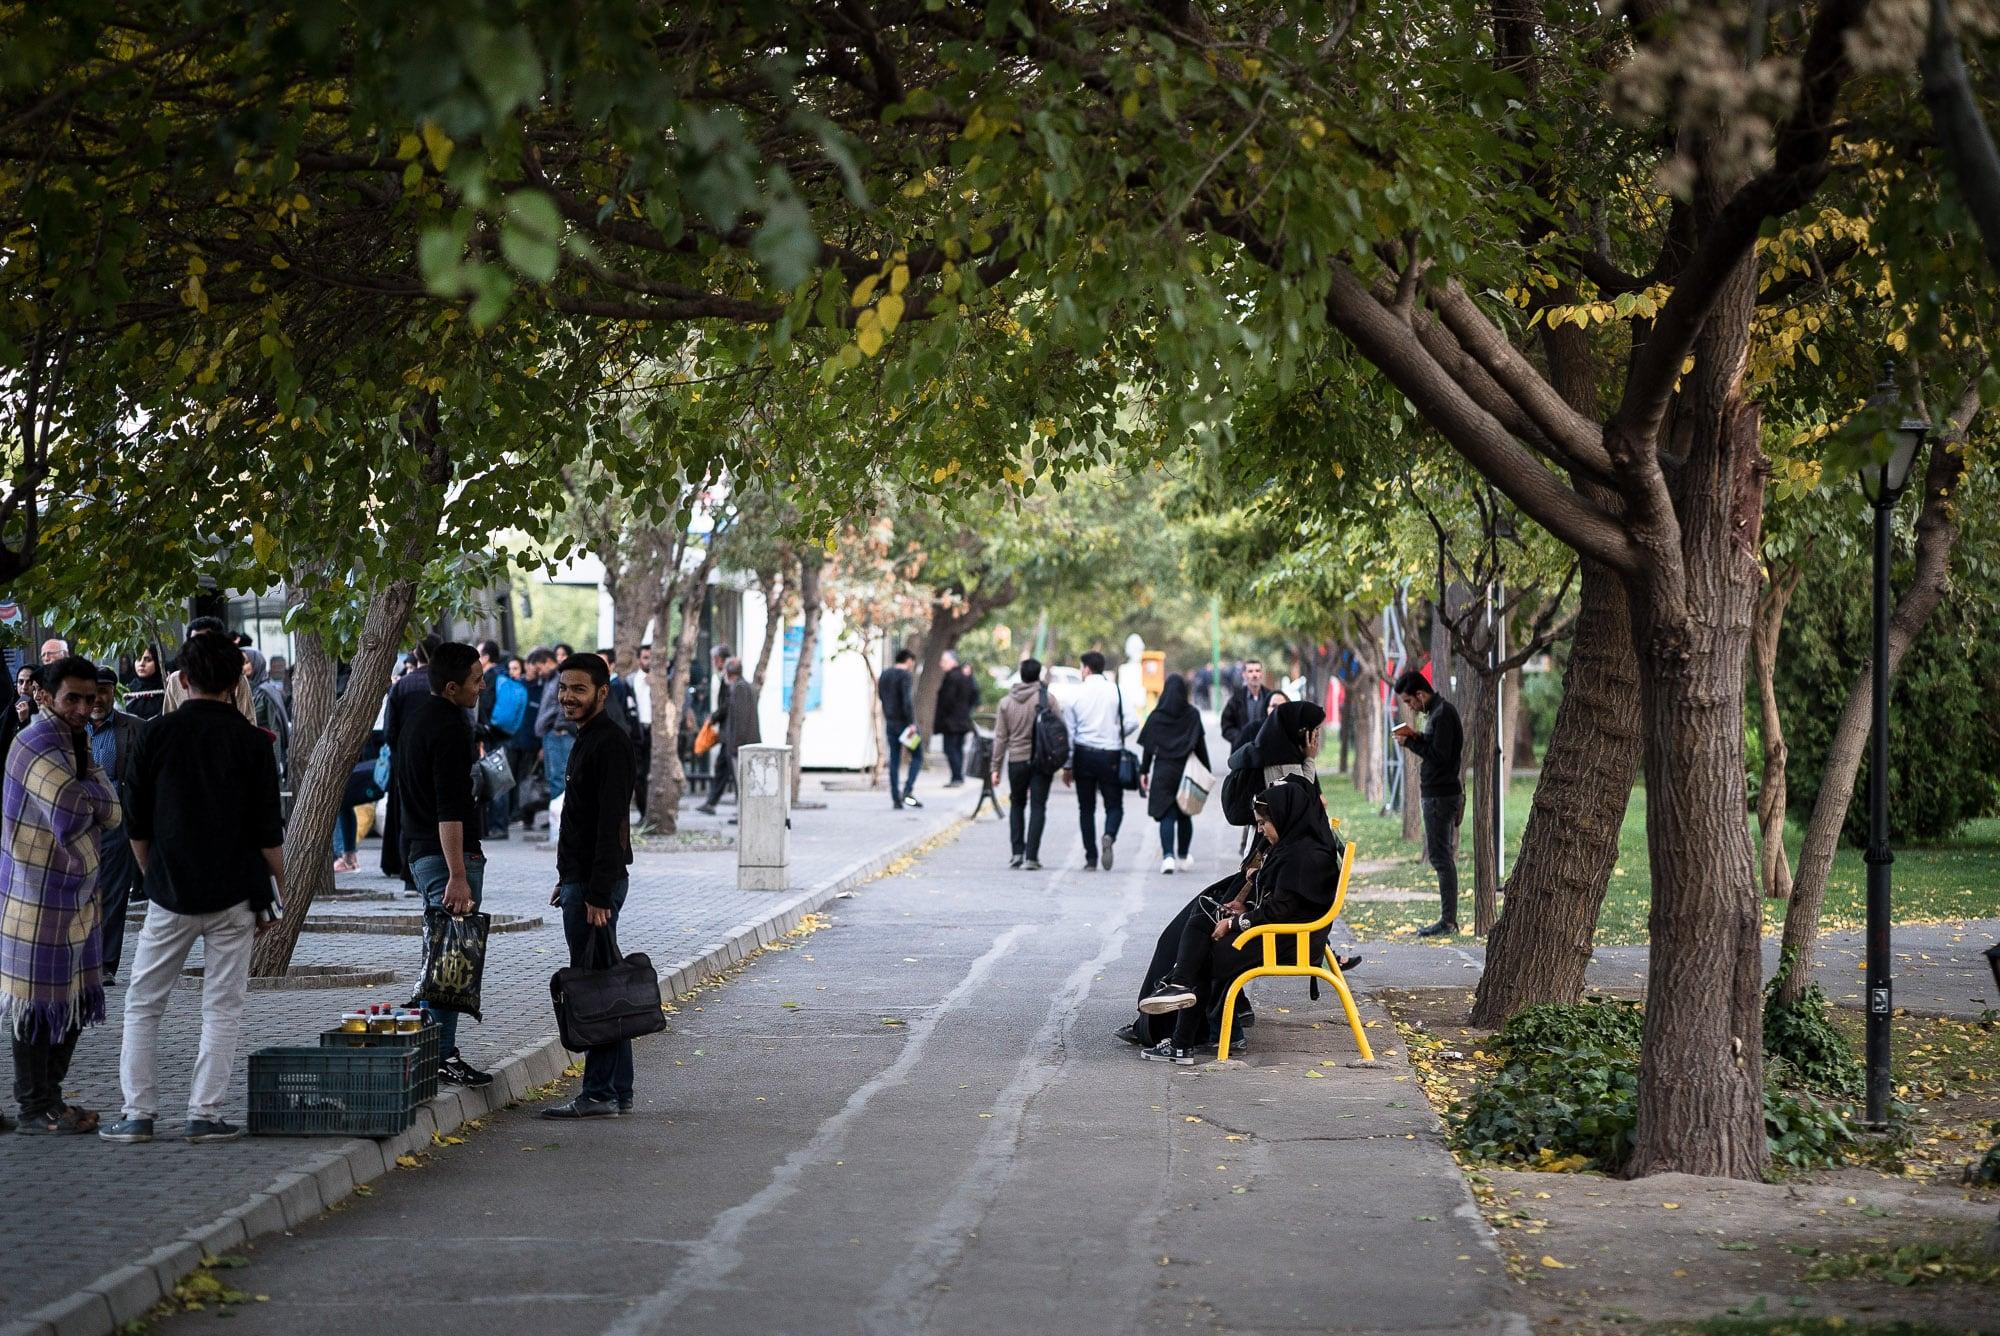 near the university